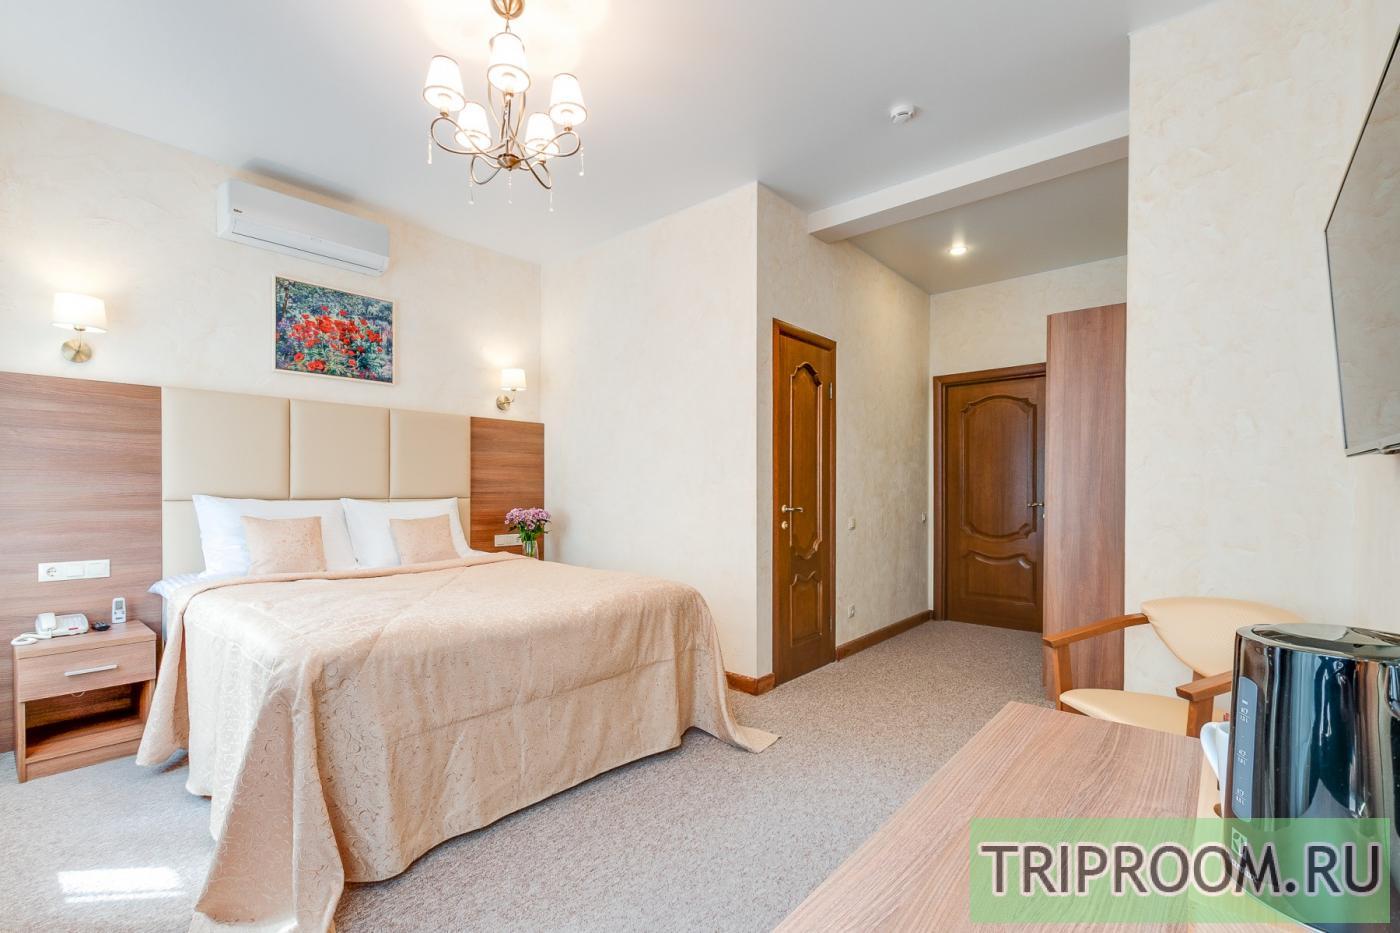 1-комнатная квартира посуточно (вариант № 20817), ул. Красноармейская 7-я улица, фото № 1